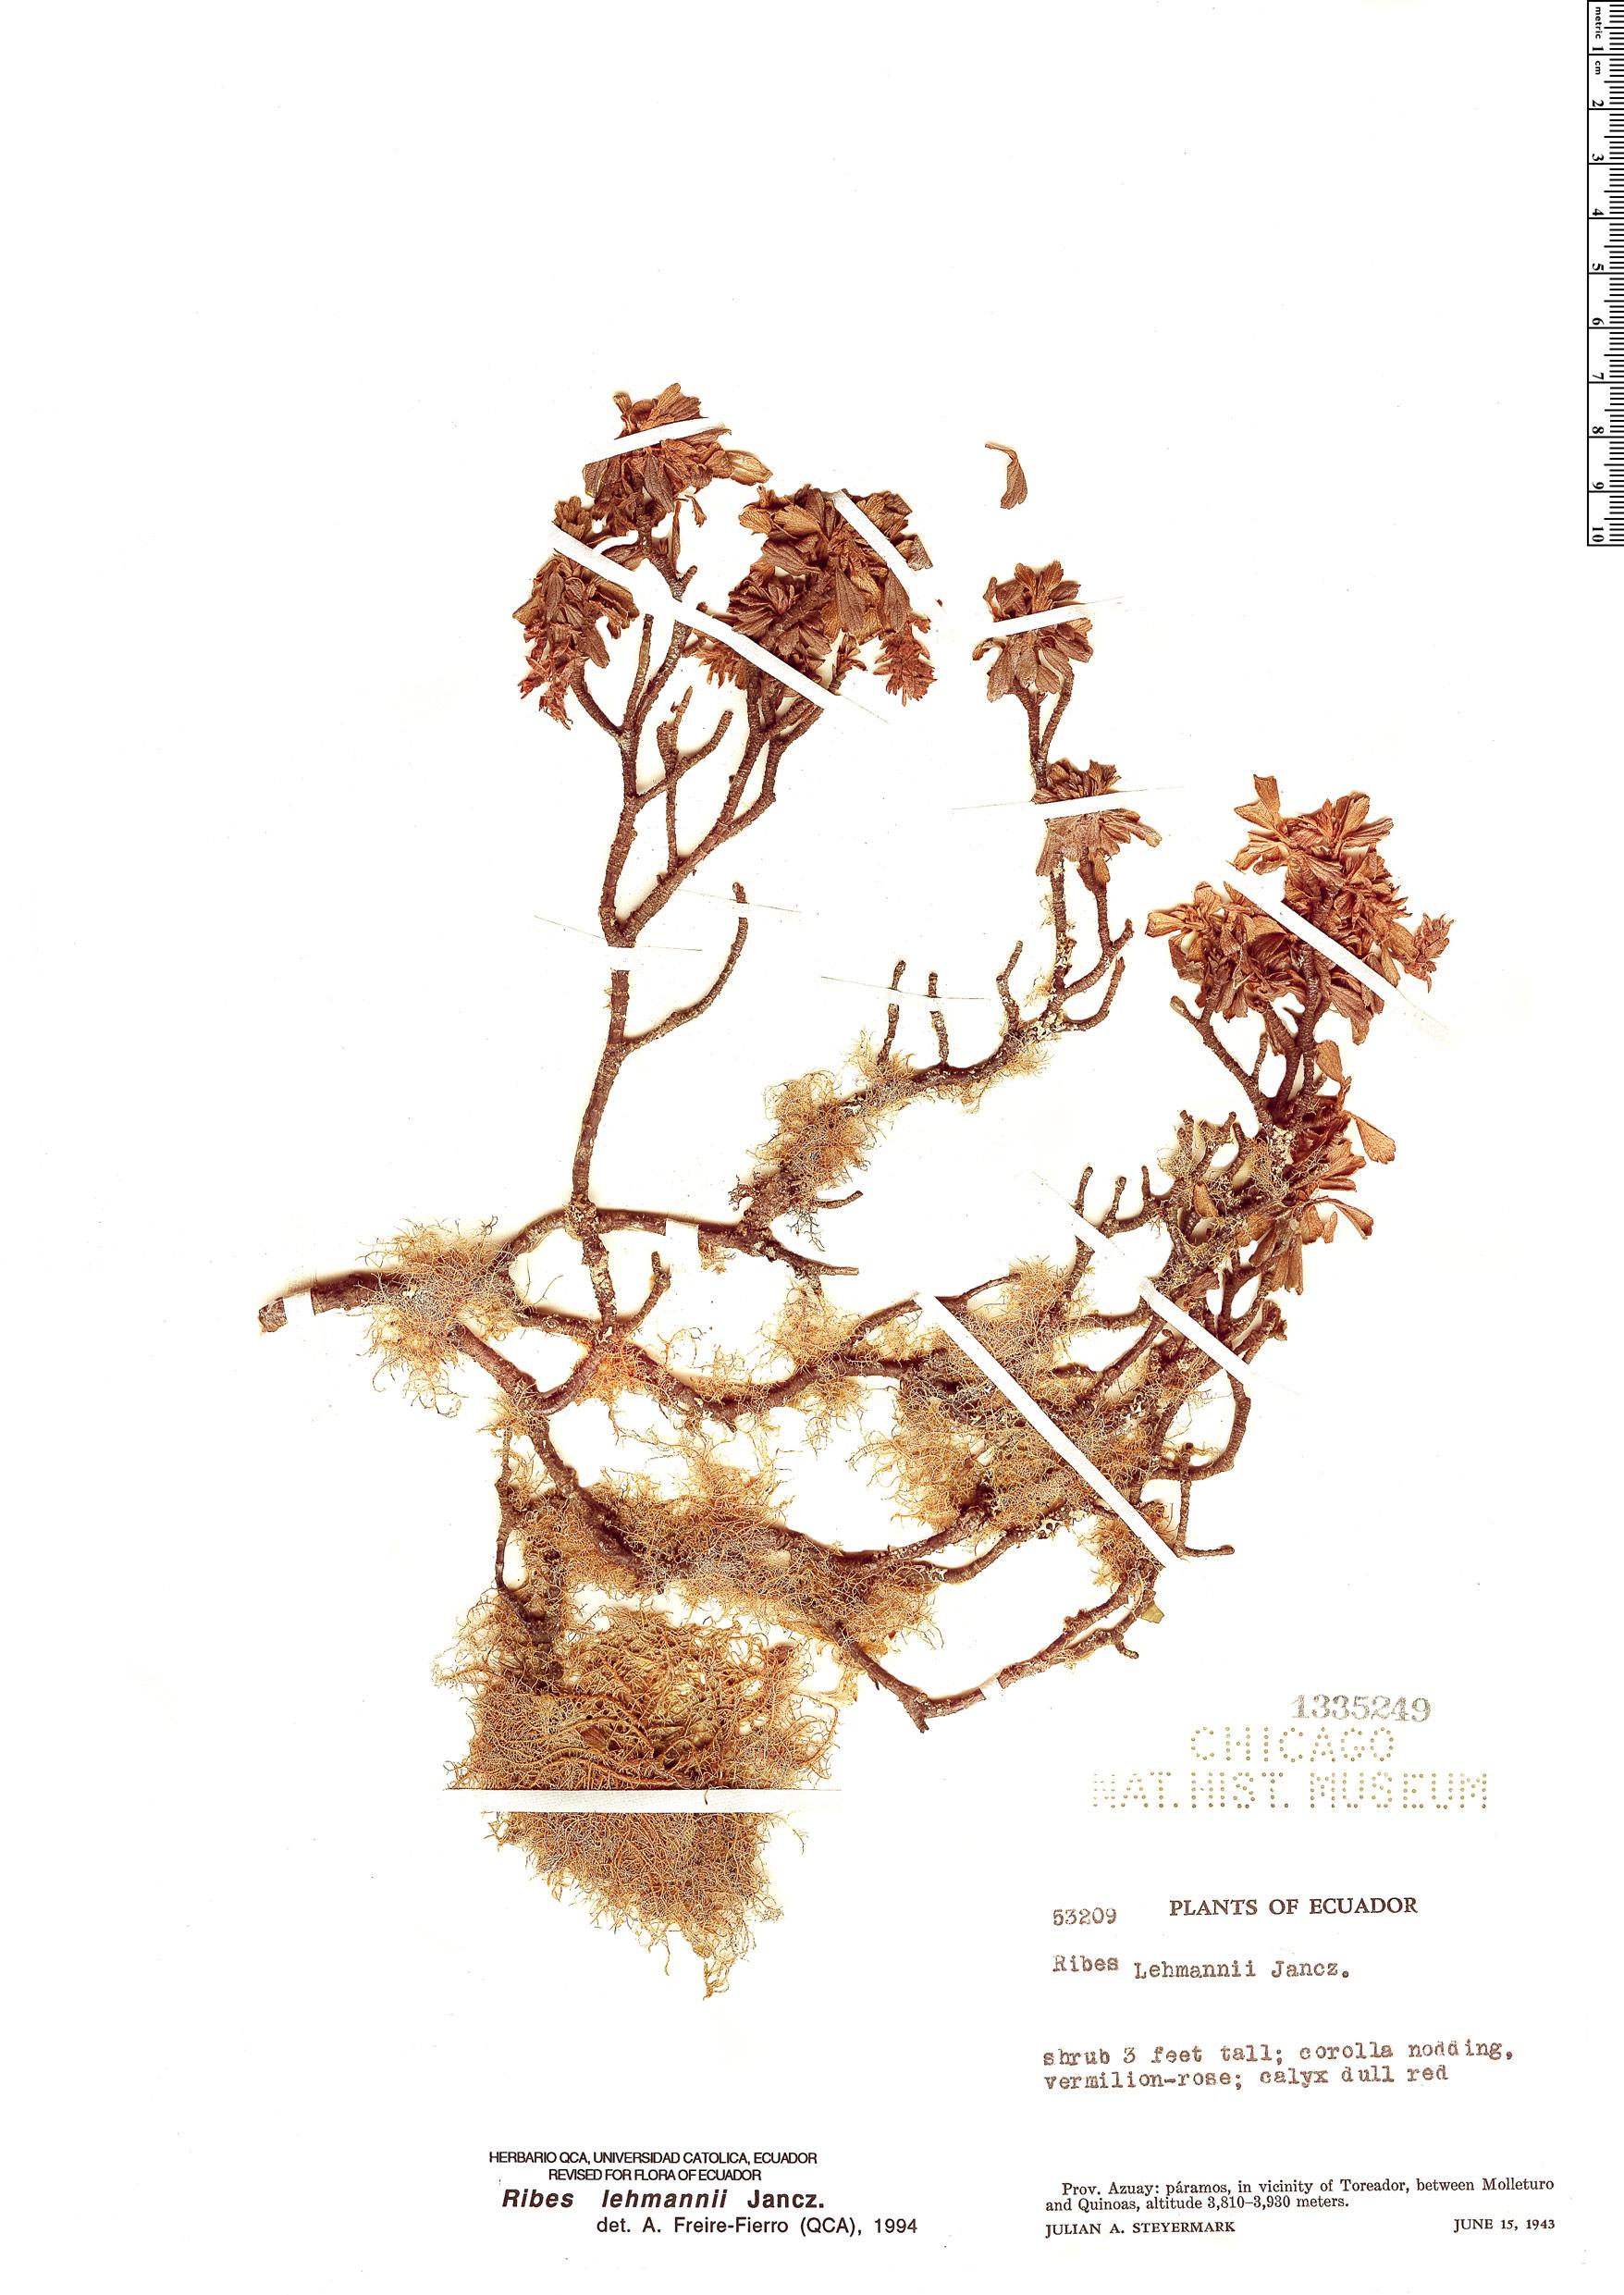 Specimen: Ribes lehmannii